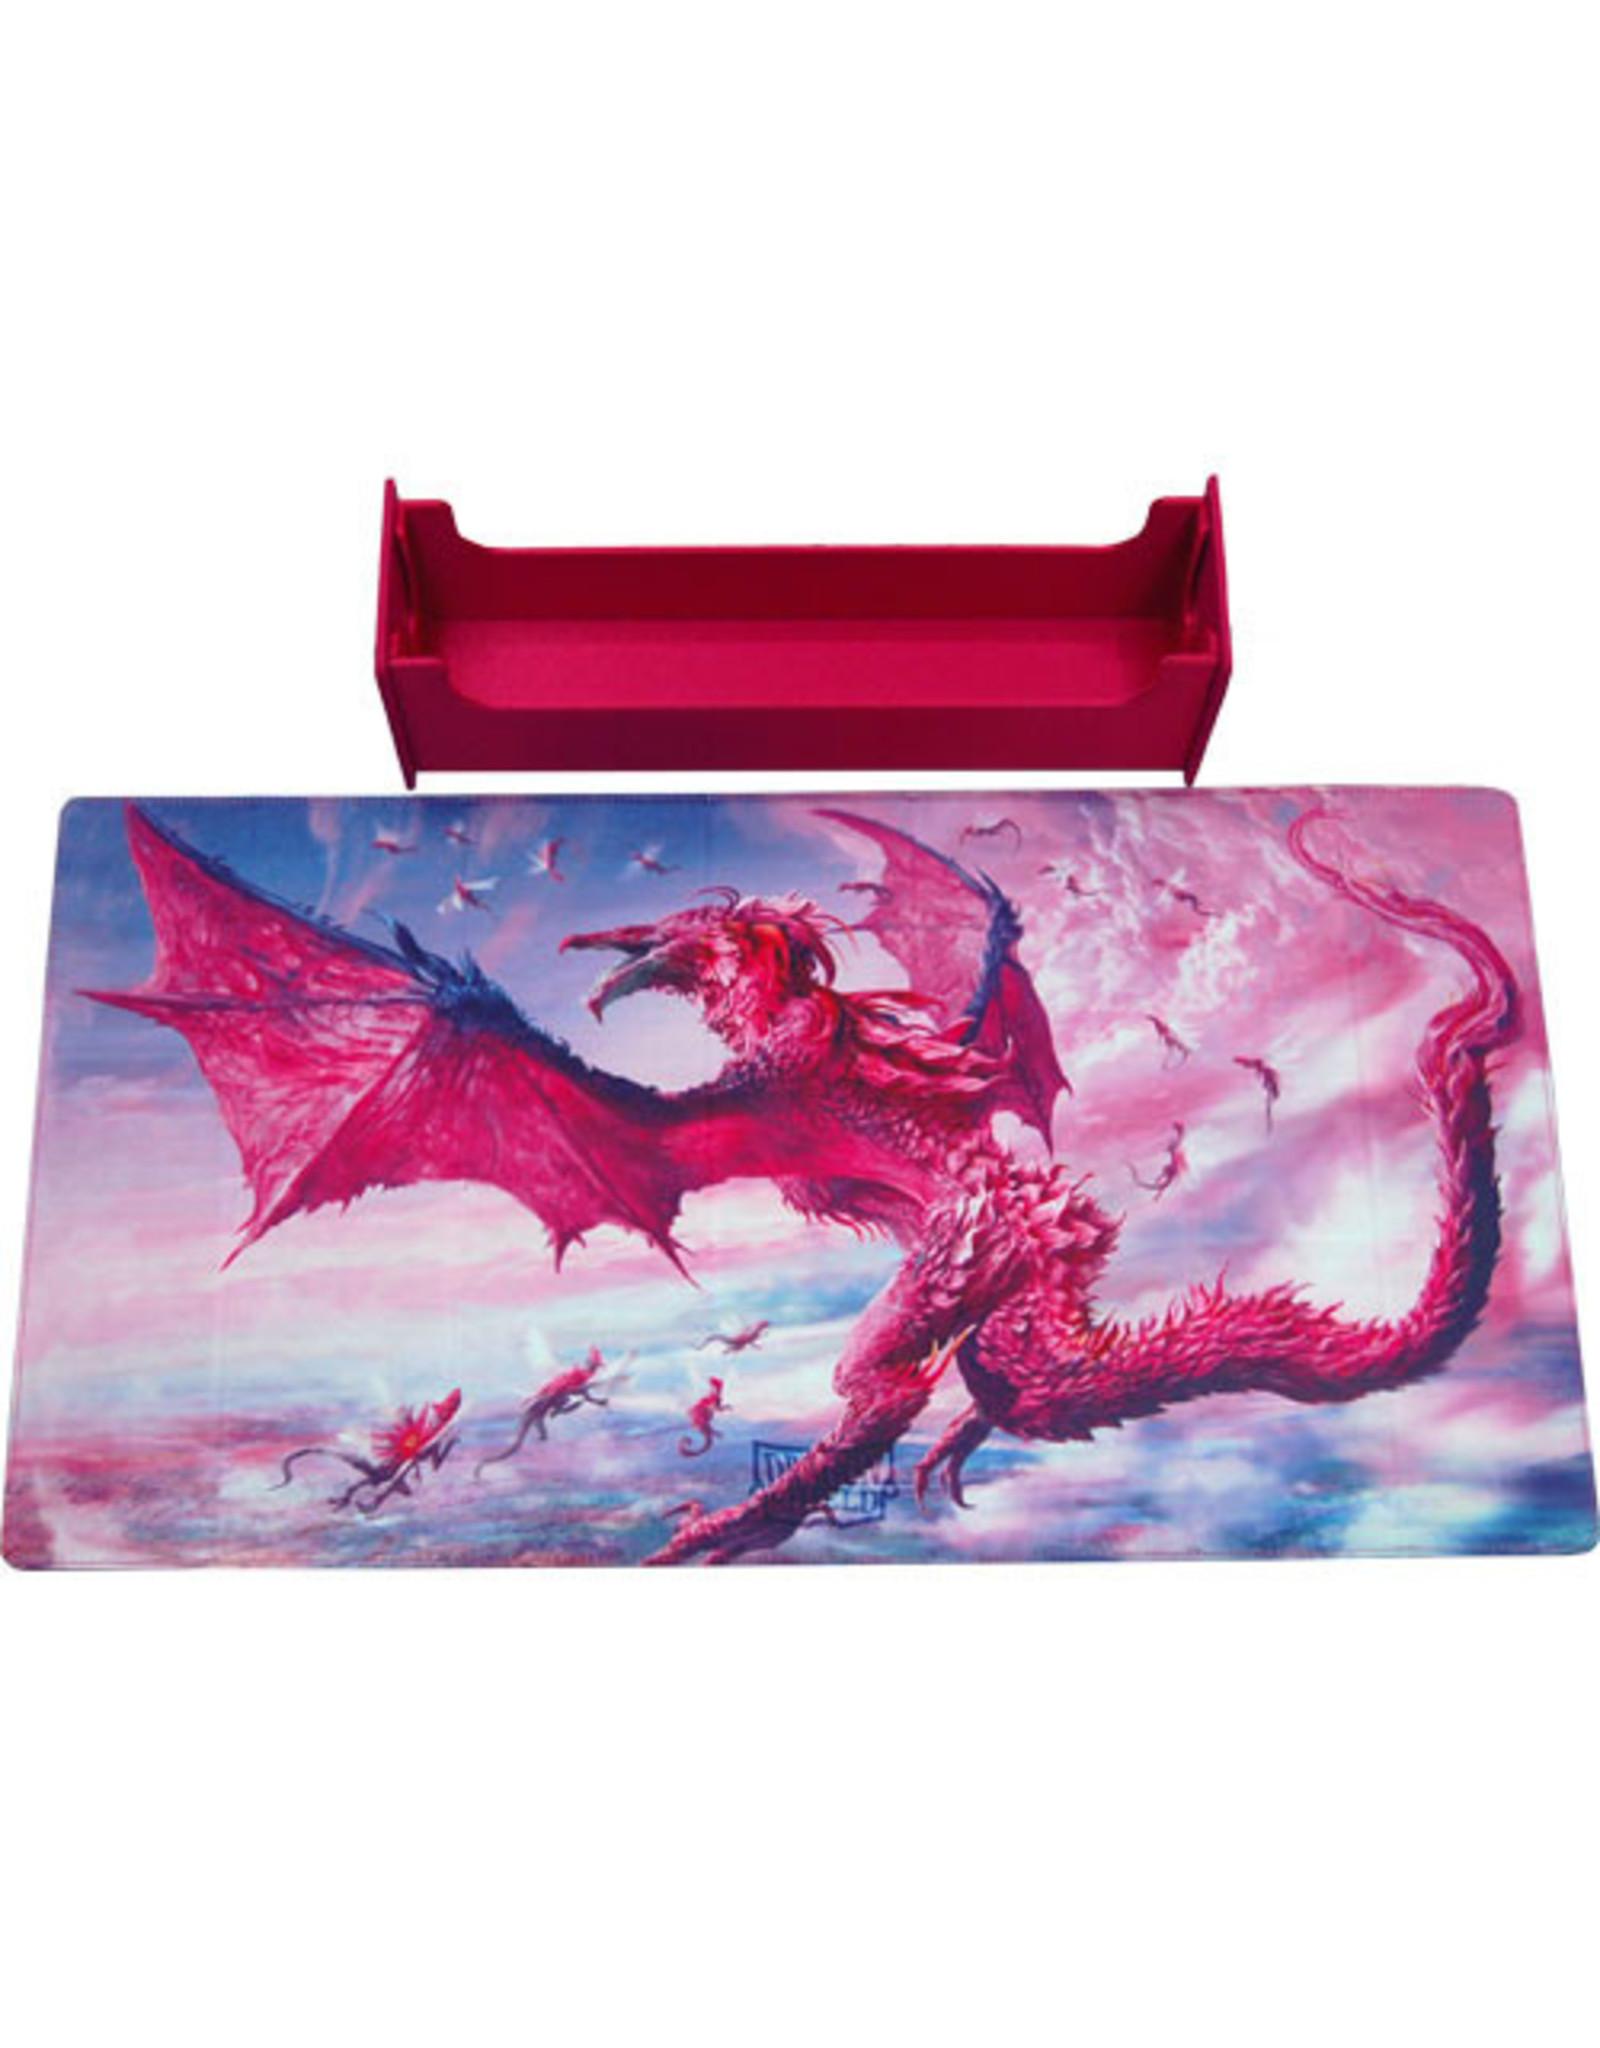 Dragon Shield Magic Carpet: Pink Diamond/Art